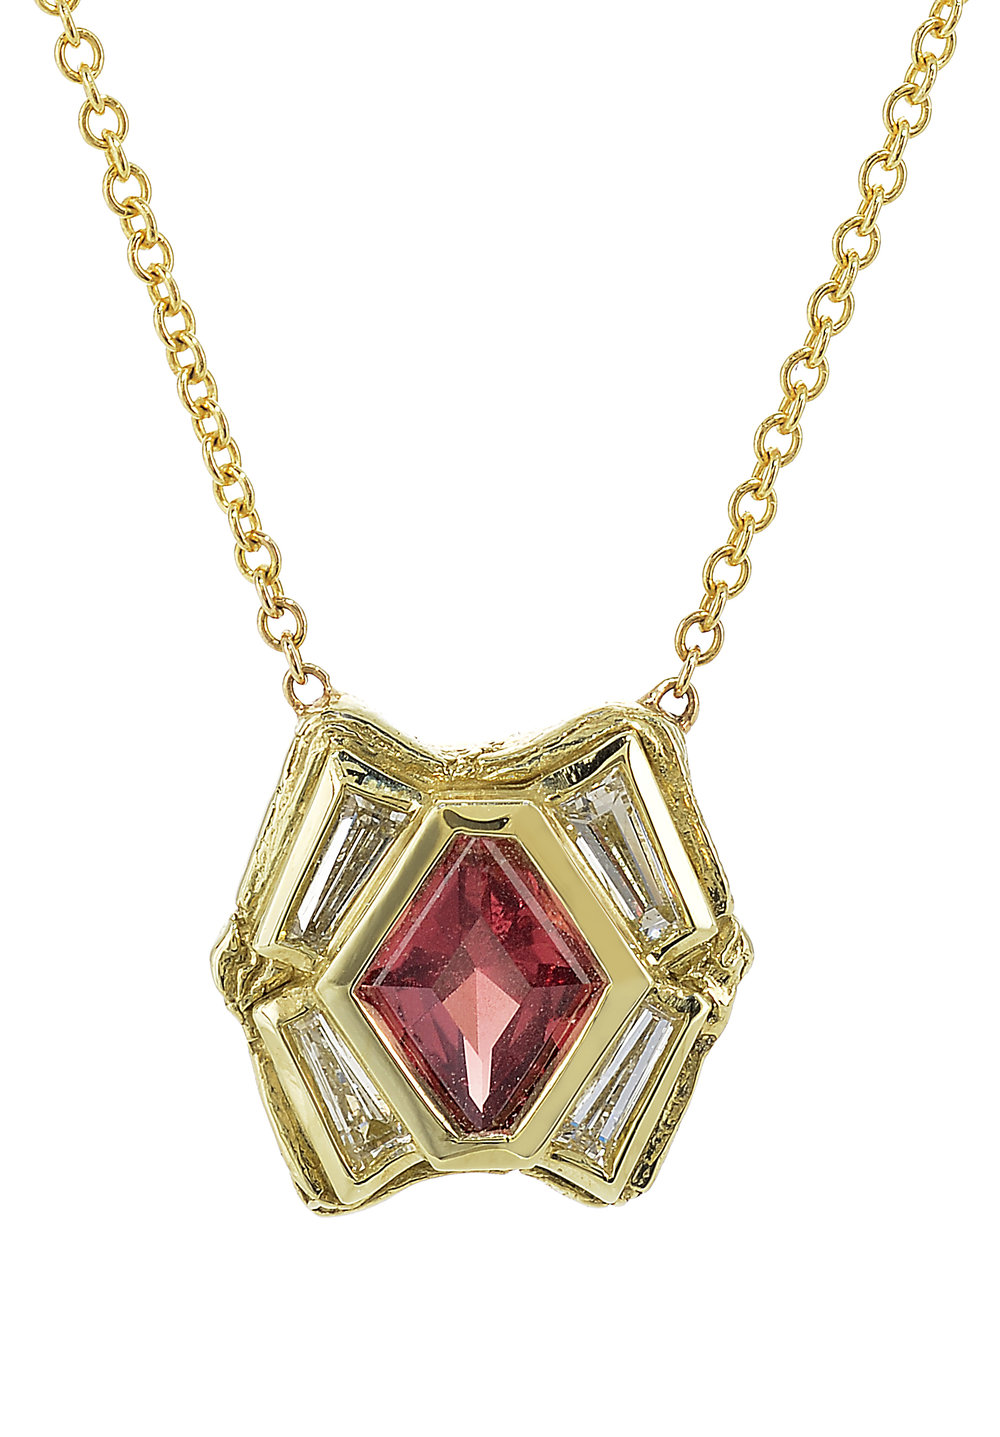 Susan-wheeler-necklace-1.jpg